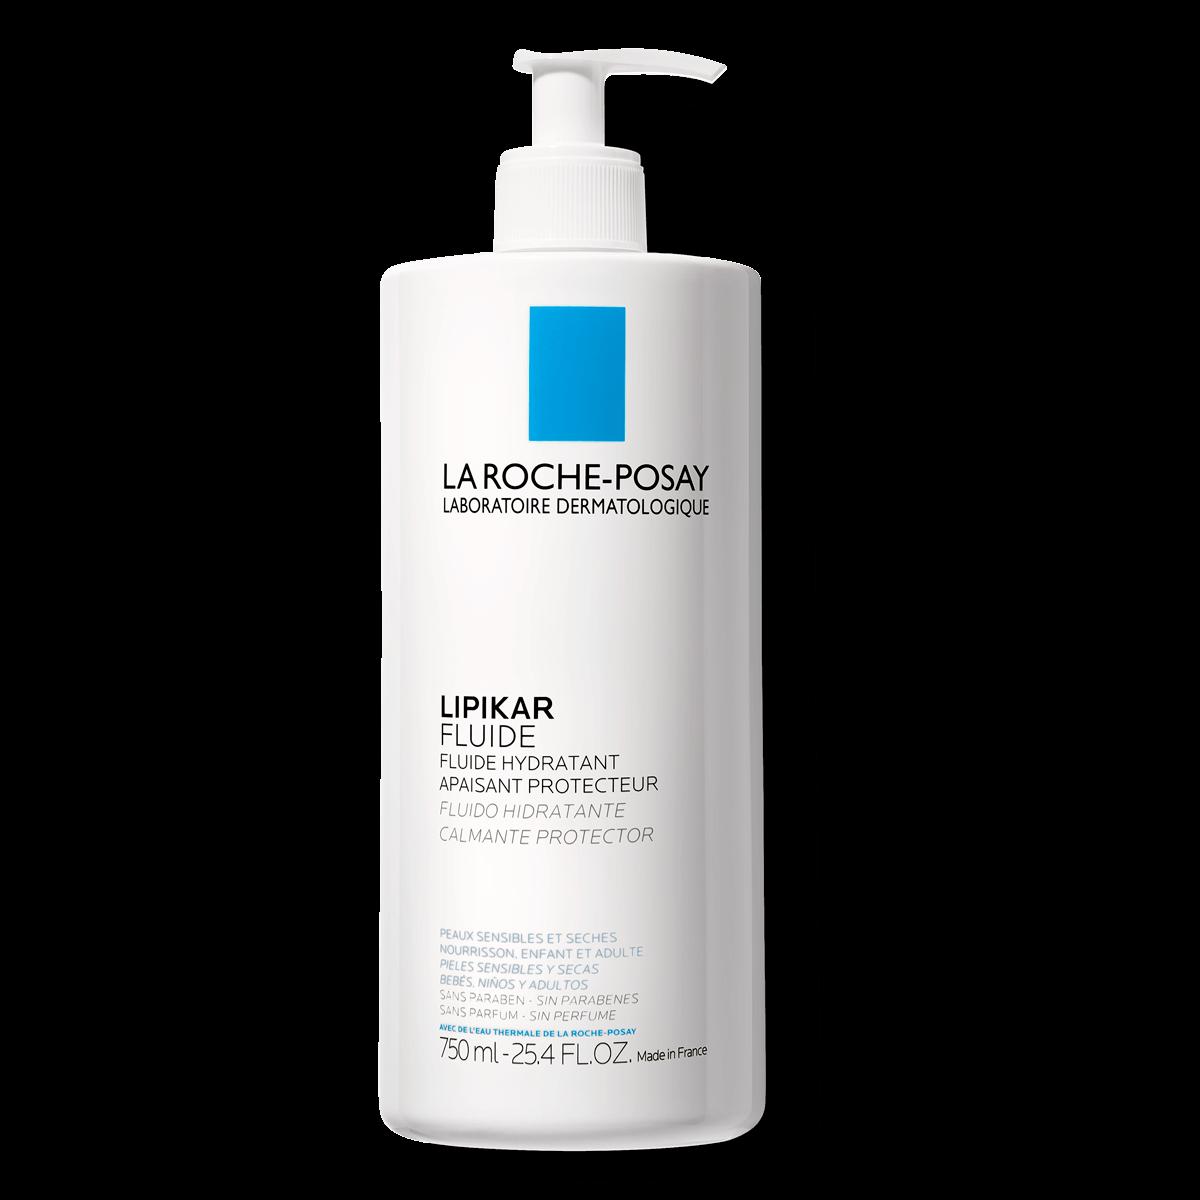 Lipikar fluid Lipikar Fluide 750 ml Przód | La Roche Posay